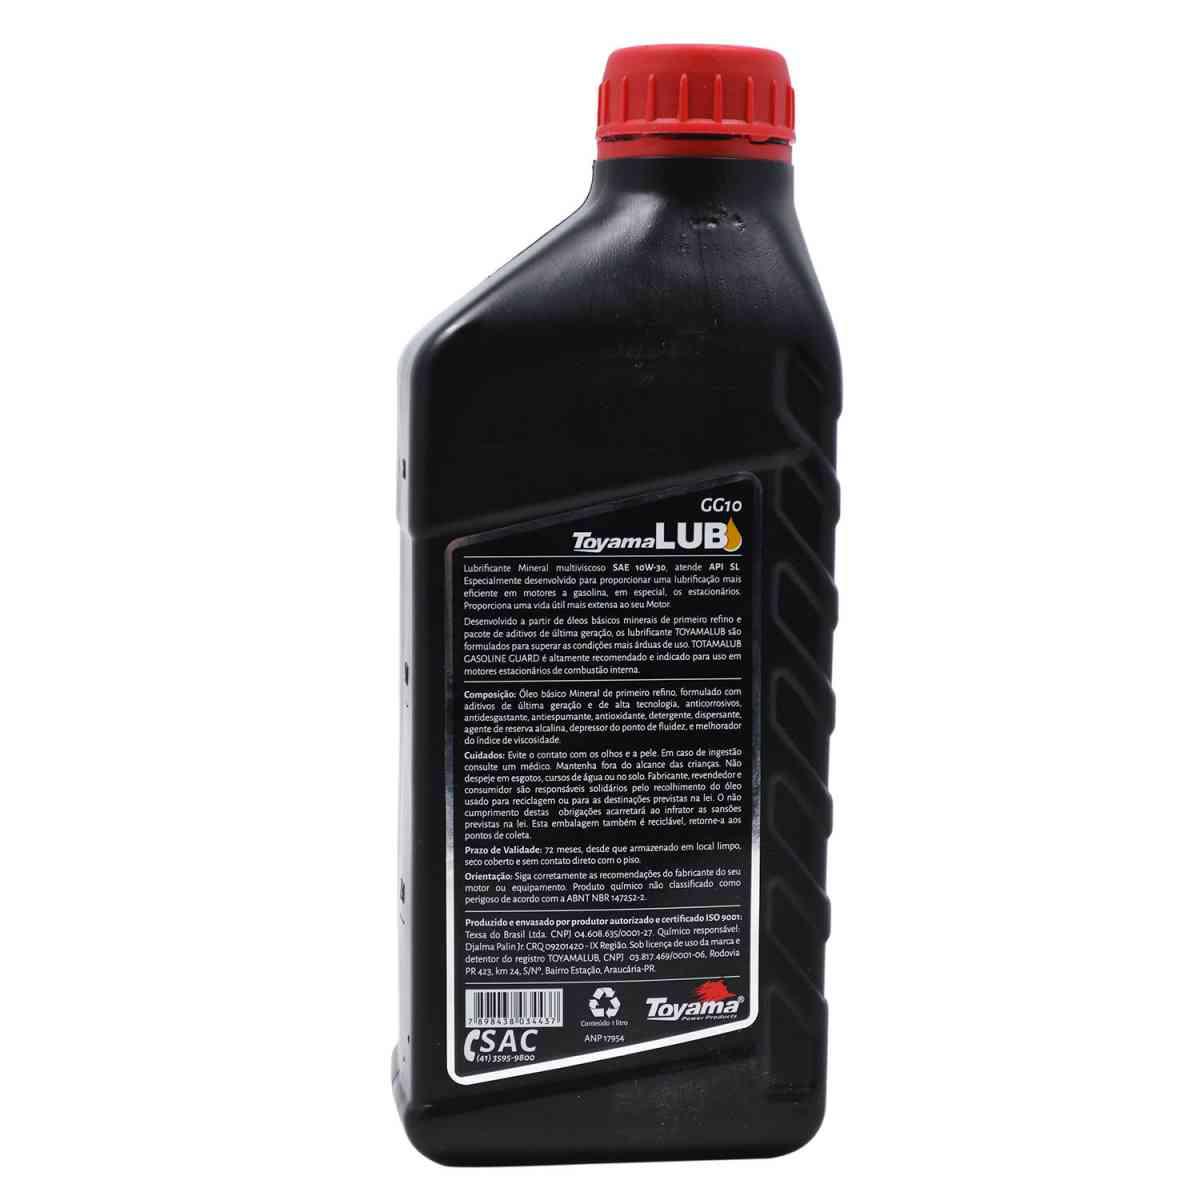 Óleo para Motor 4 Tempos a Gasolina 1LT 10W30 SL GG10 Toyama